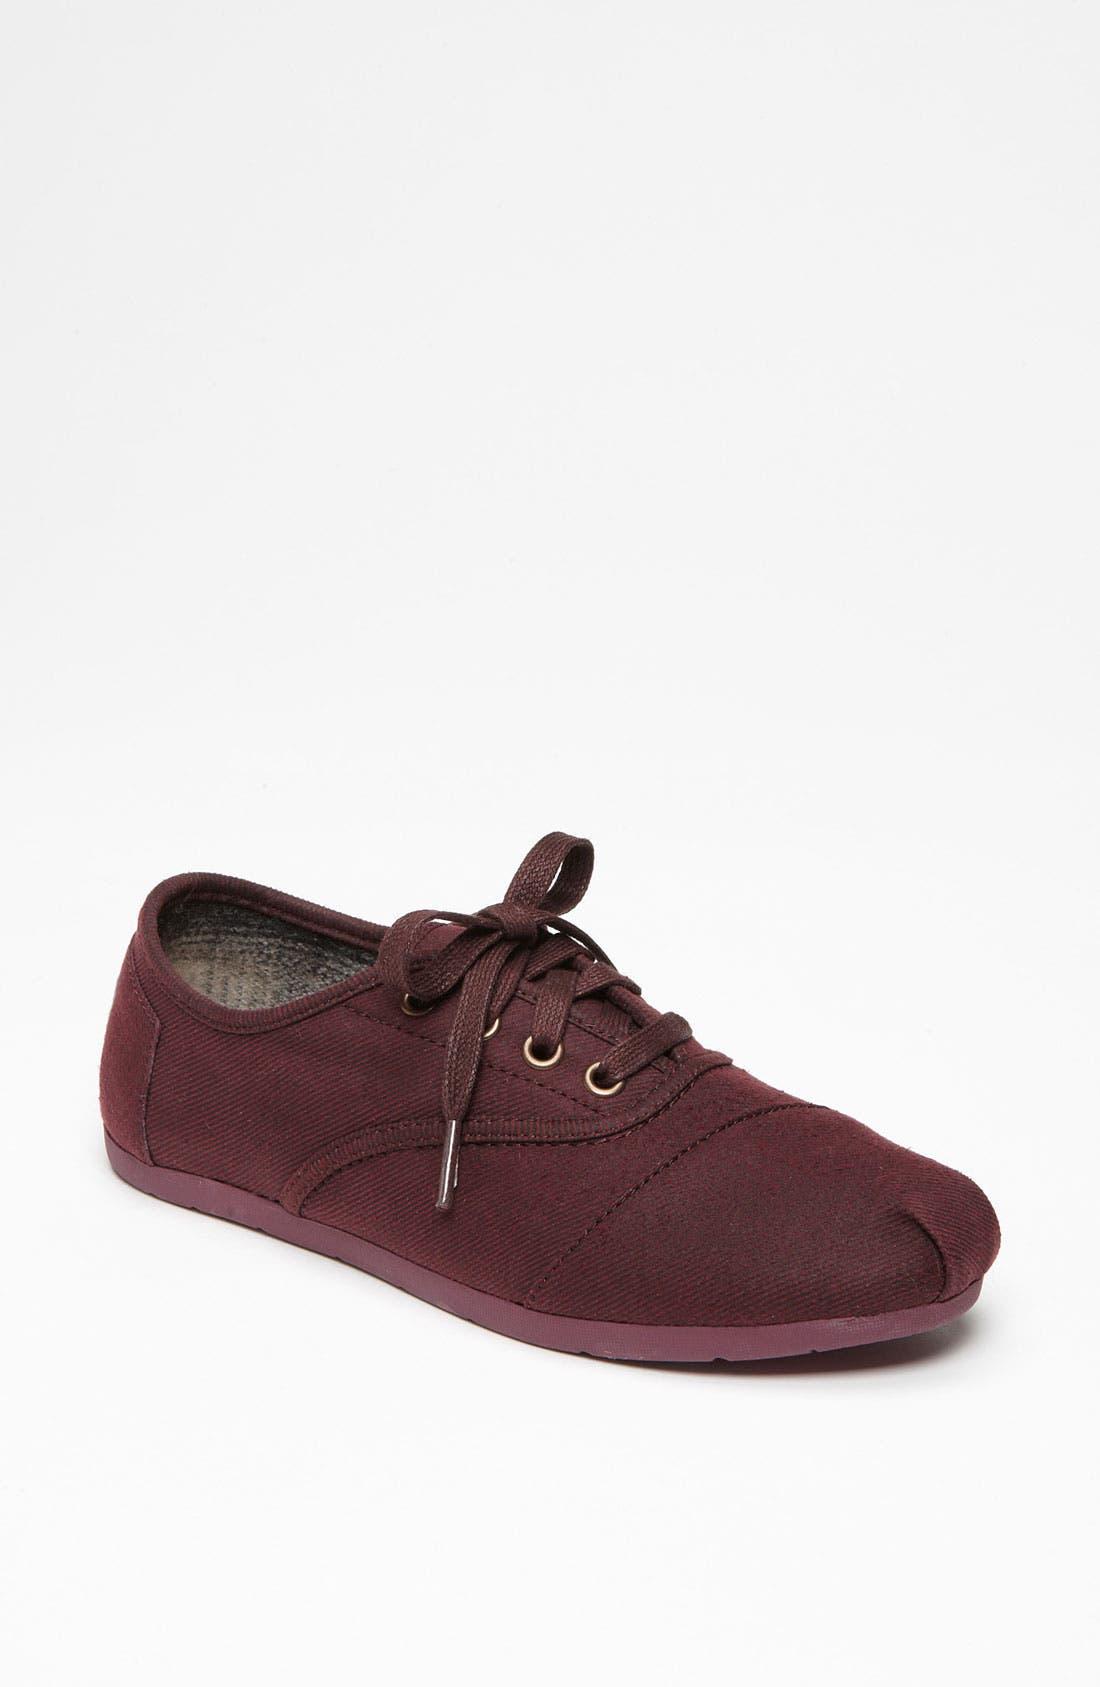 Alternate Image 1 Selected - TOMS 'Cordones - Colton' Sneaker (Women)